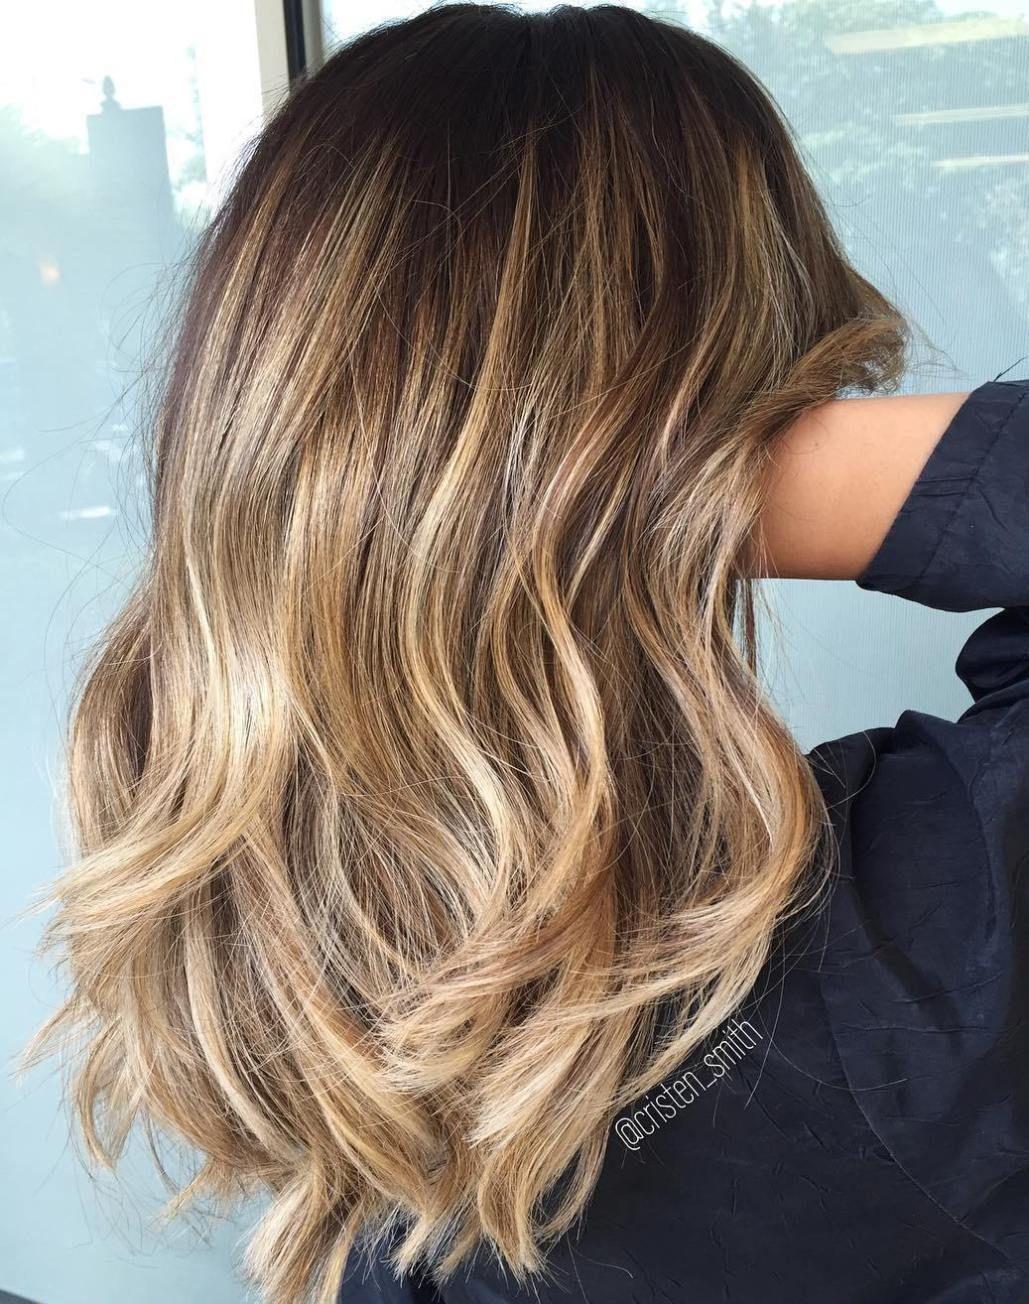 48 Trendy Hair Ideas Shoulder Length Colour Waves Brown Hair Balayage Hair Styles Hair Color Balayage